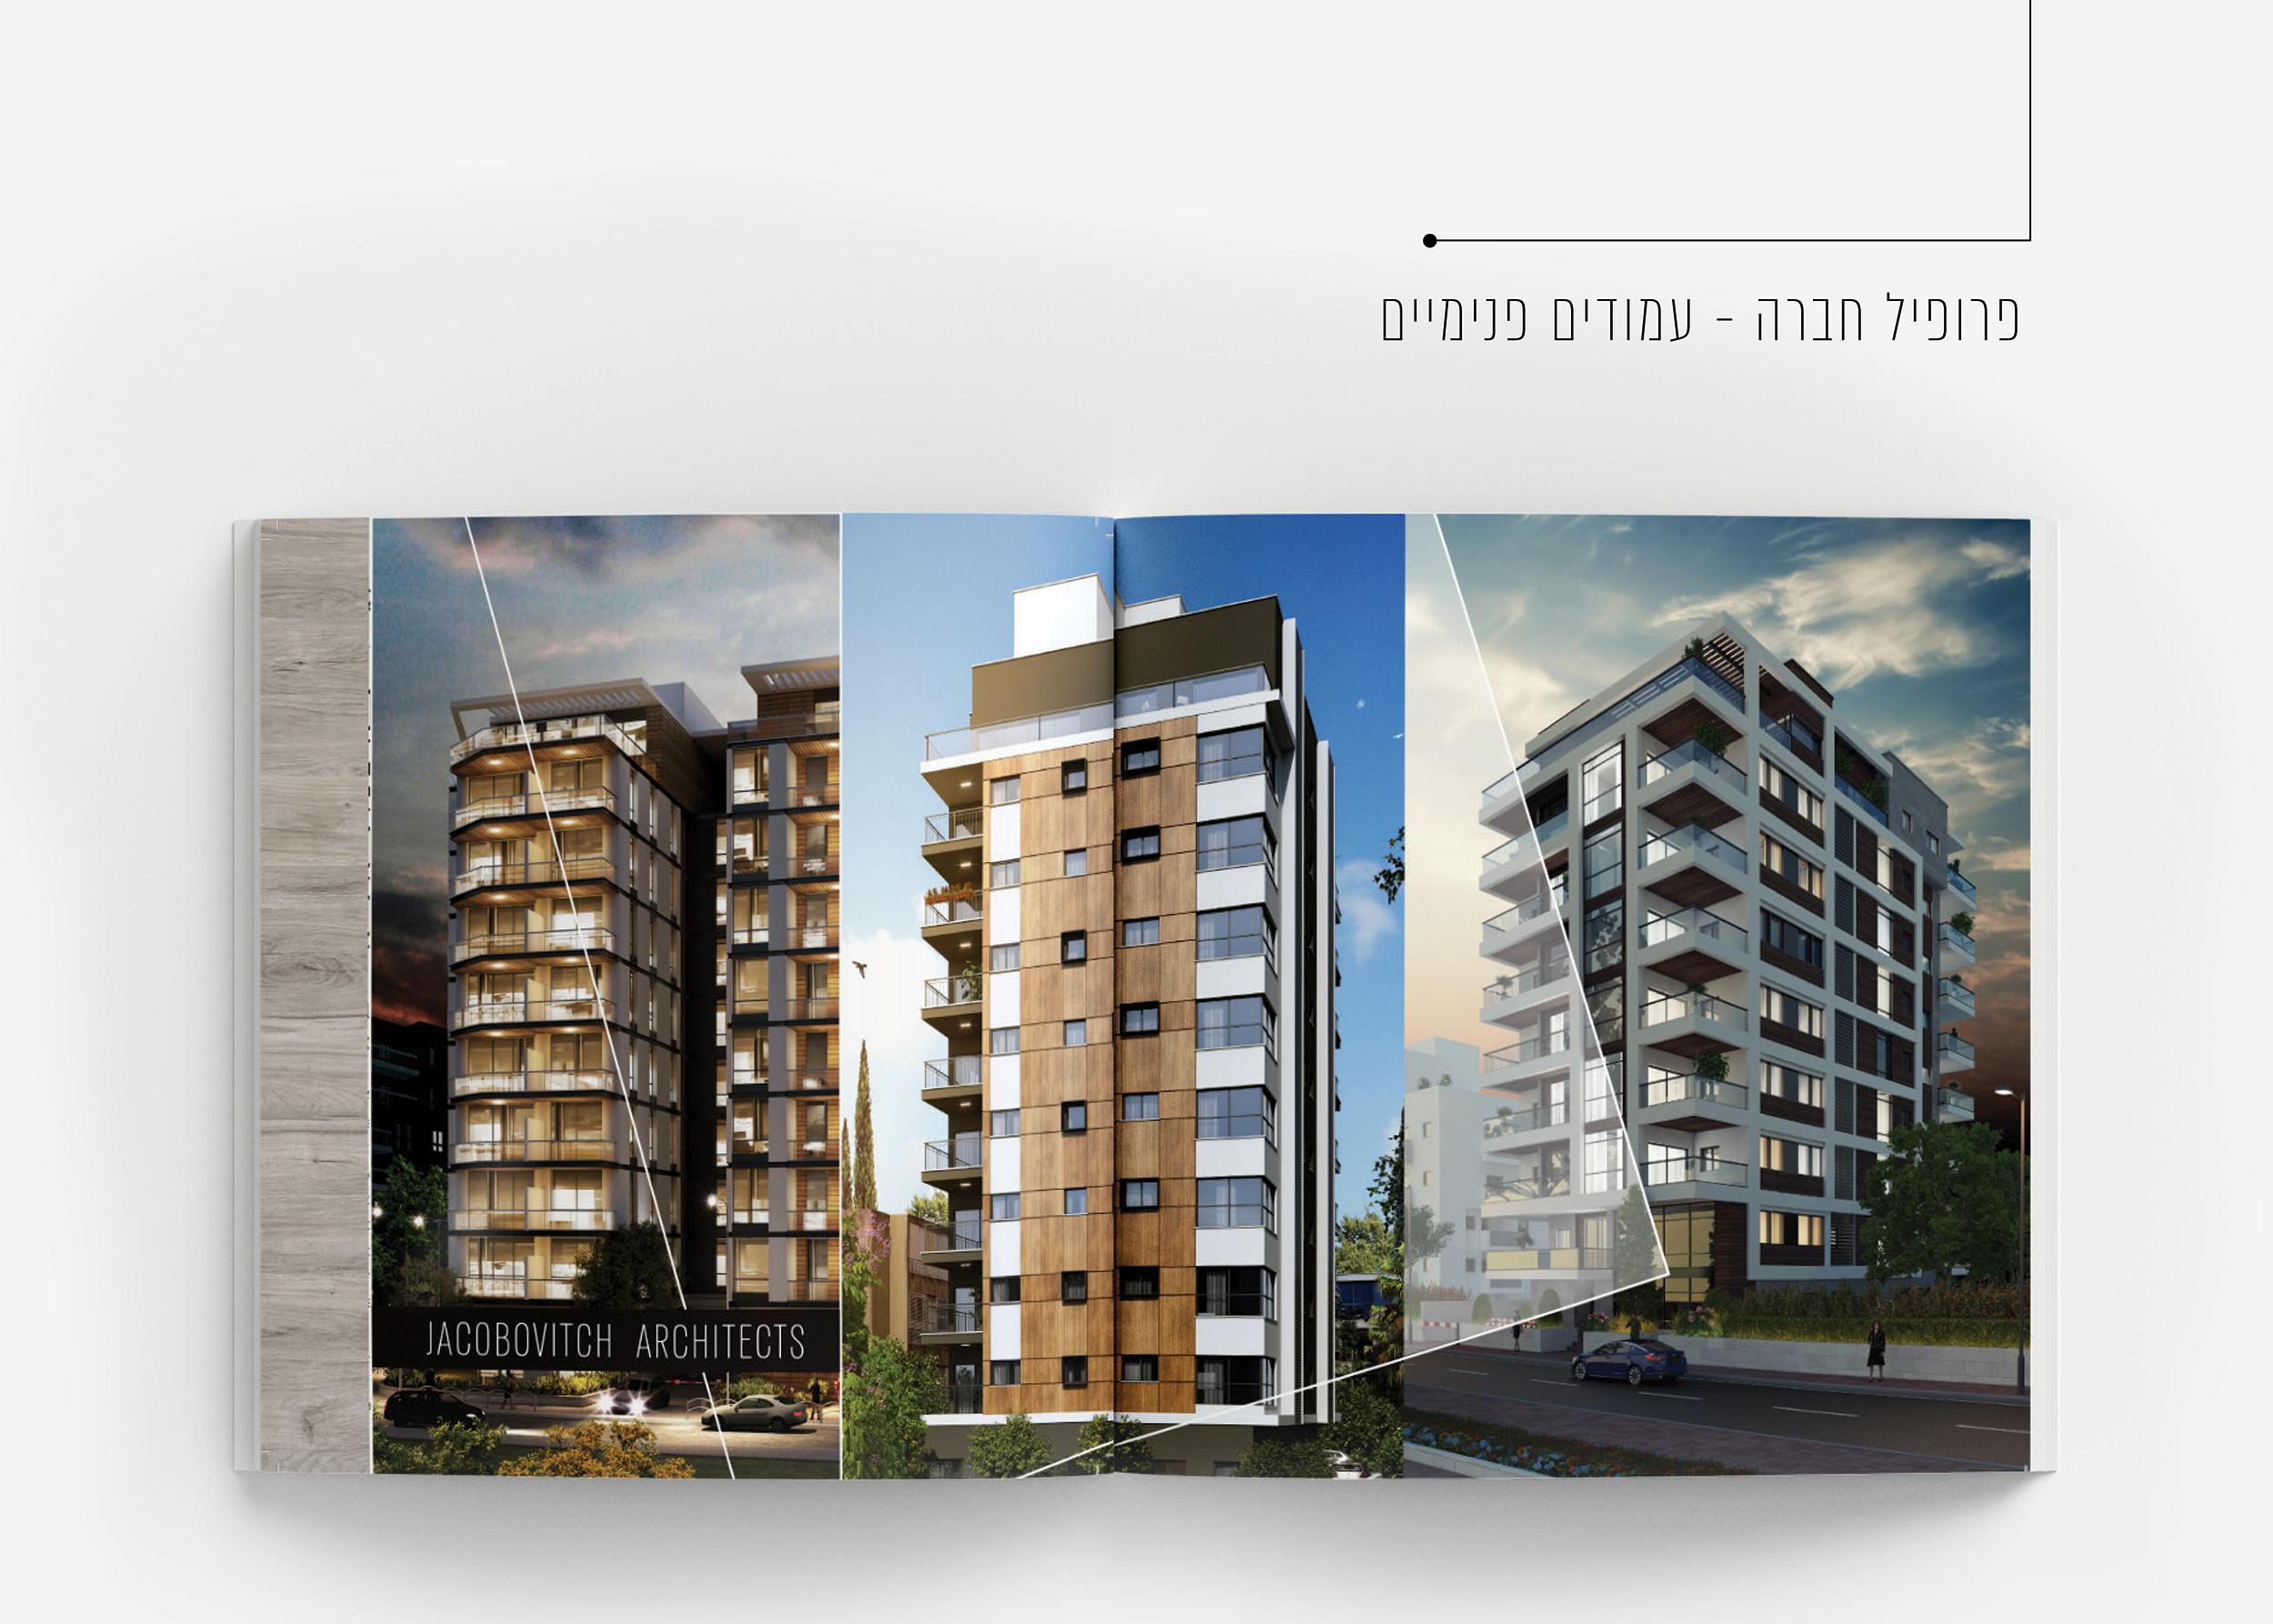 יעקובוביץ אדריכלים-מיתוג